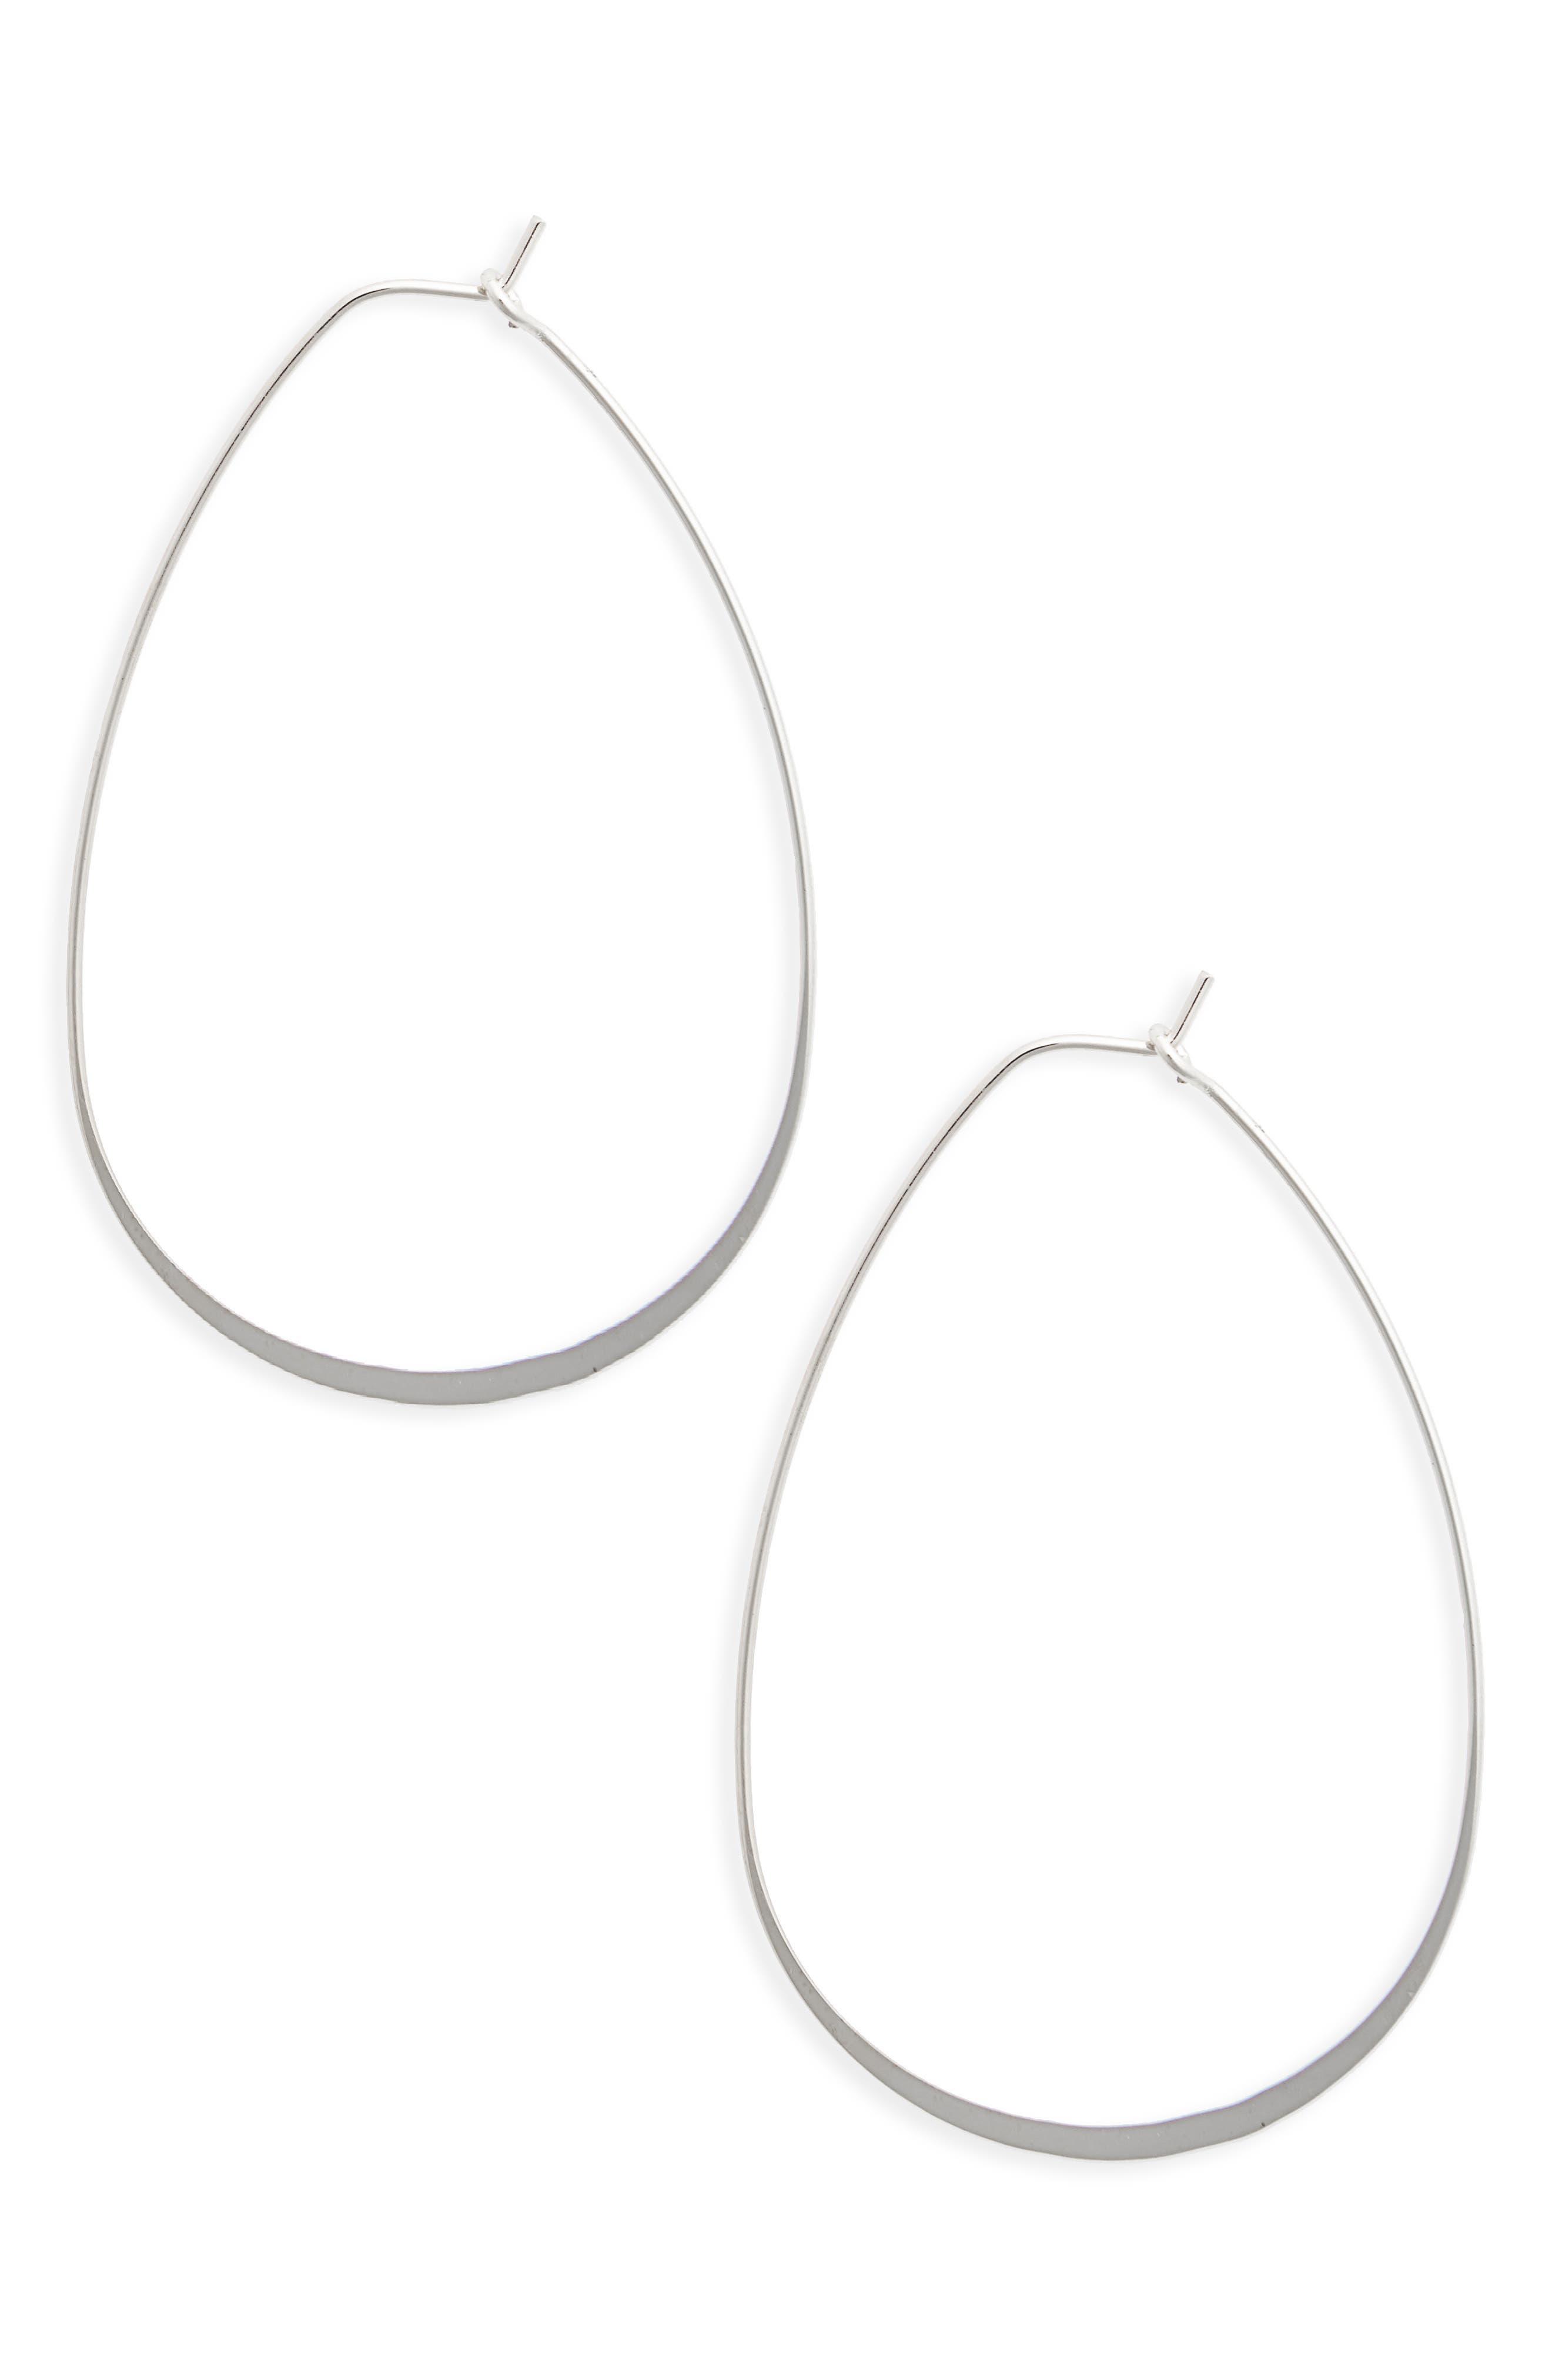 Flat Oval Hoop Earrings,                         Main,                         color, Silver